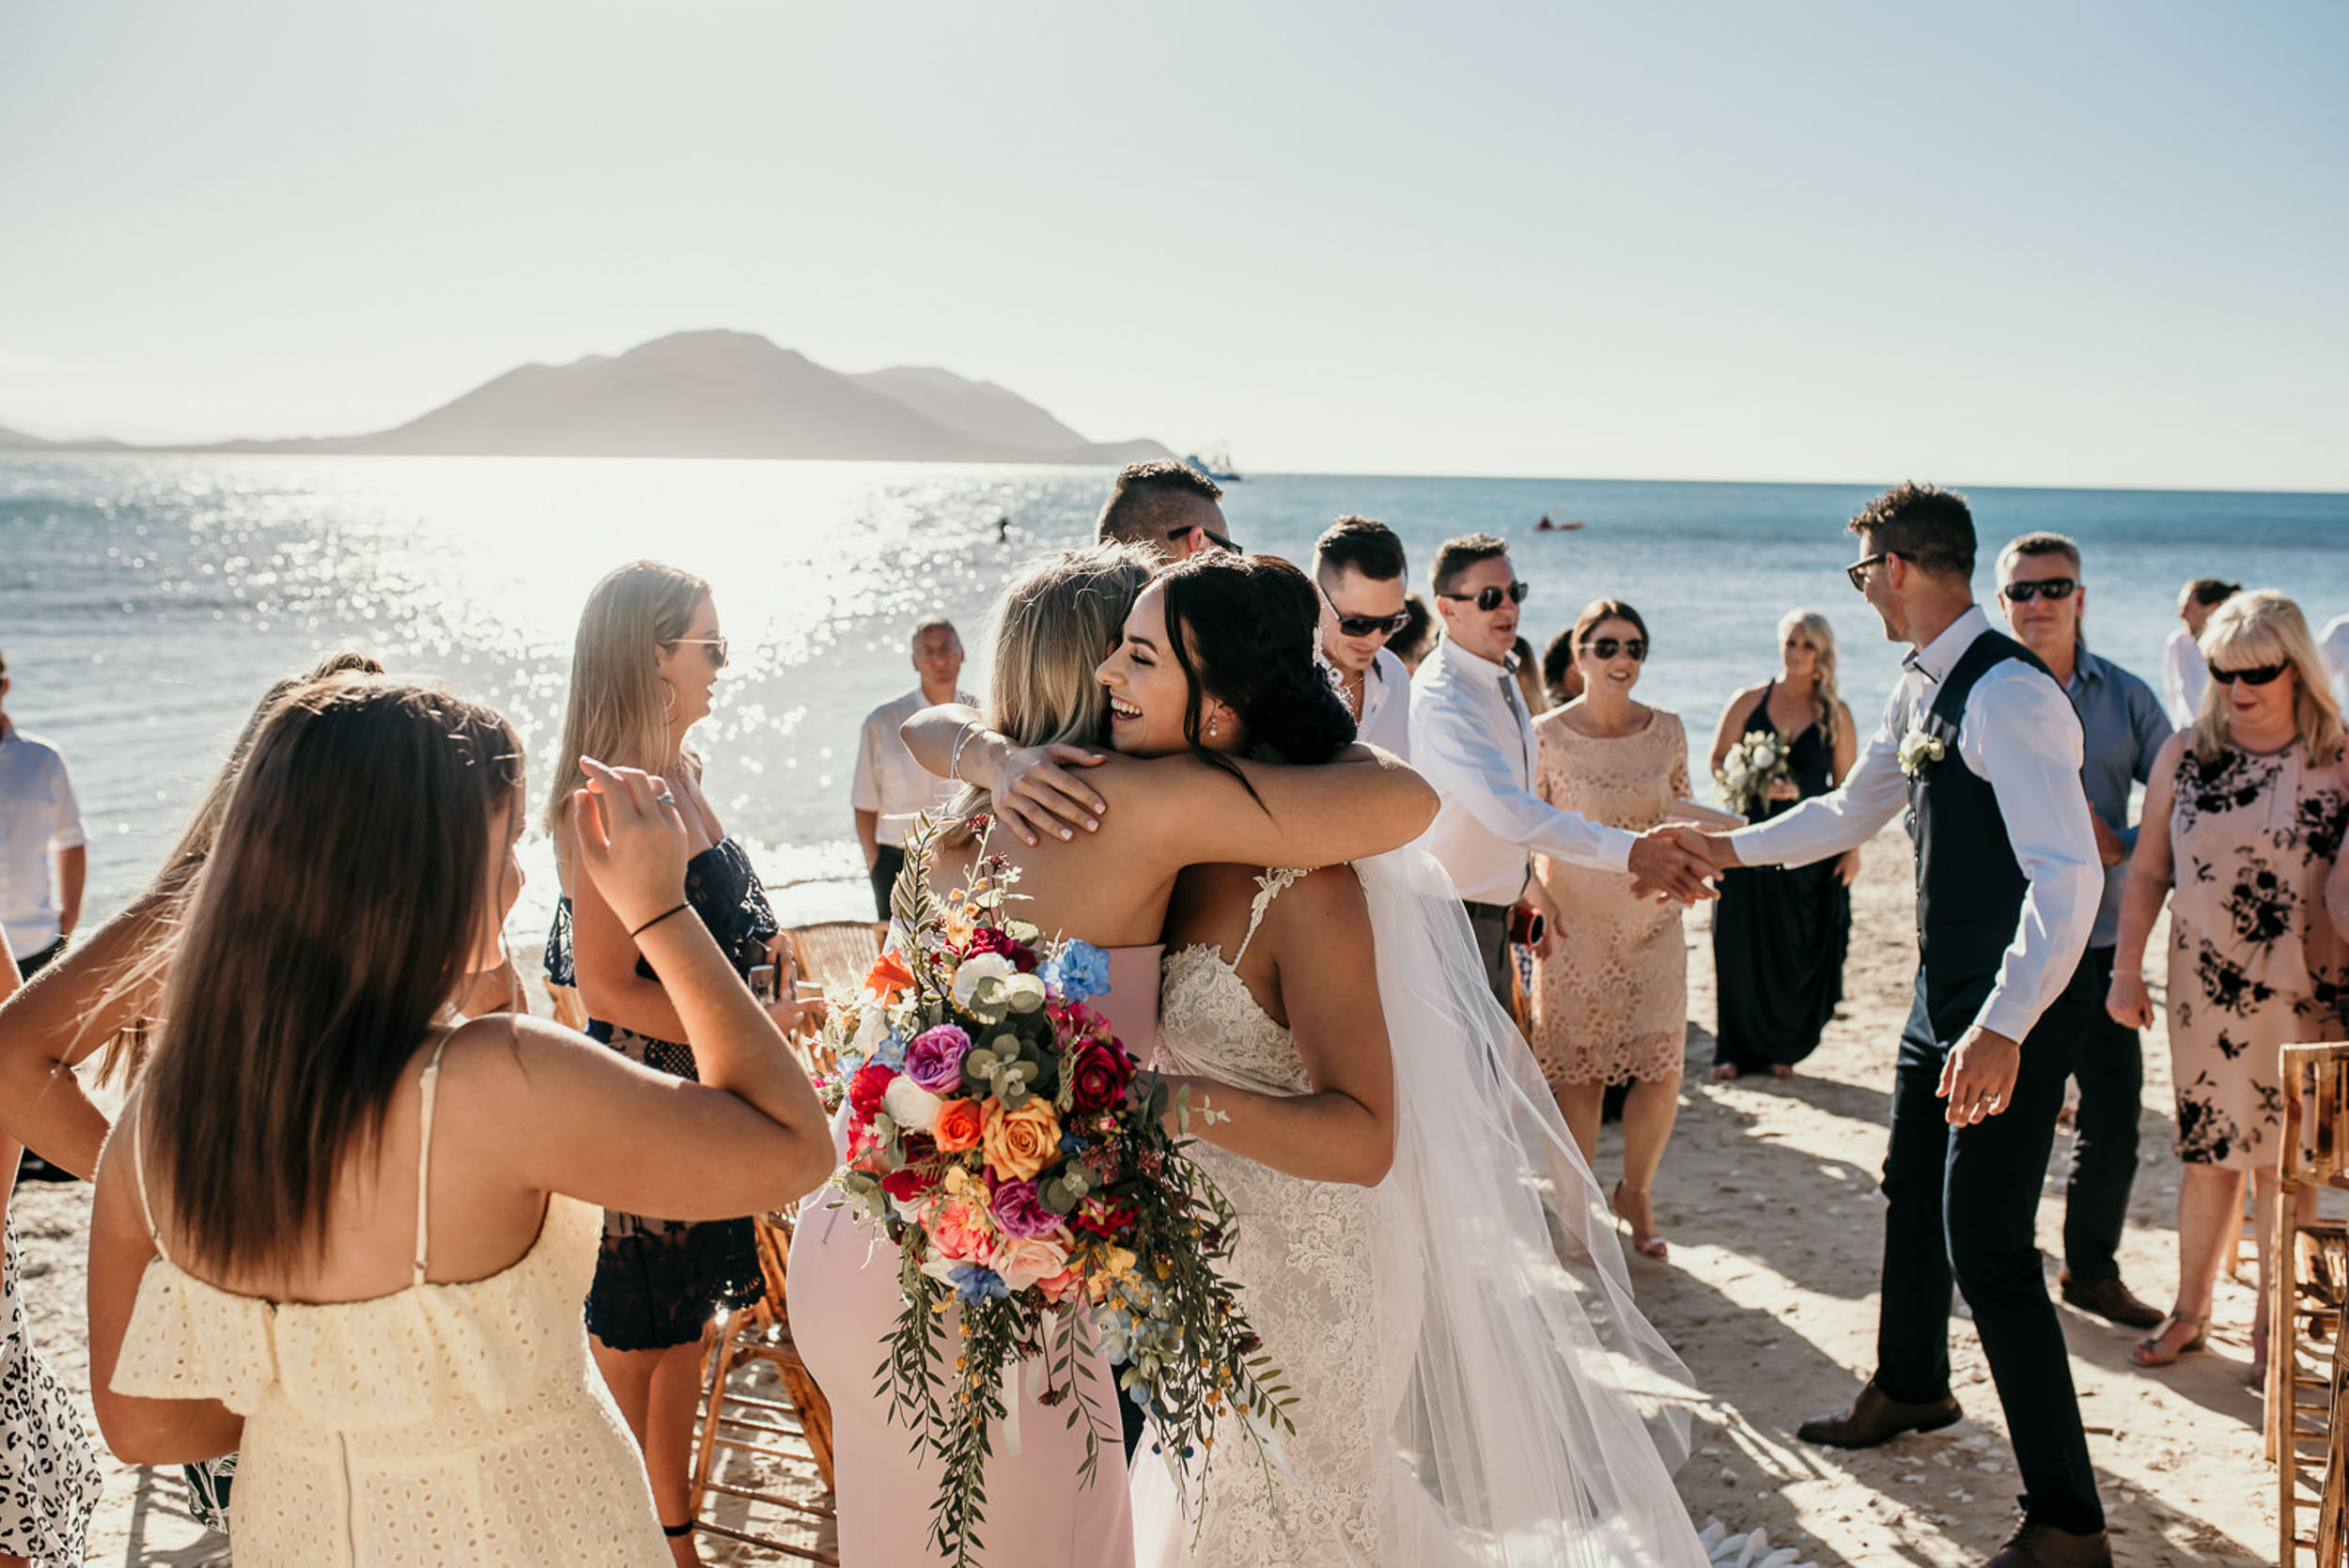 The Raw Photographer - Cairns Wedding Photographer - Fitzroy Island - Destination Wedding - Bride Dress - Groom Portrait - Queensland-26.jpg